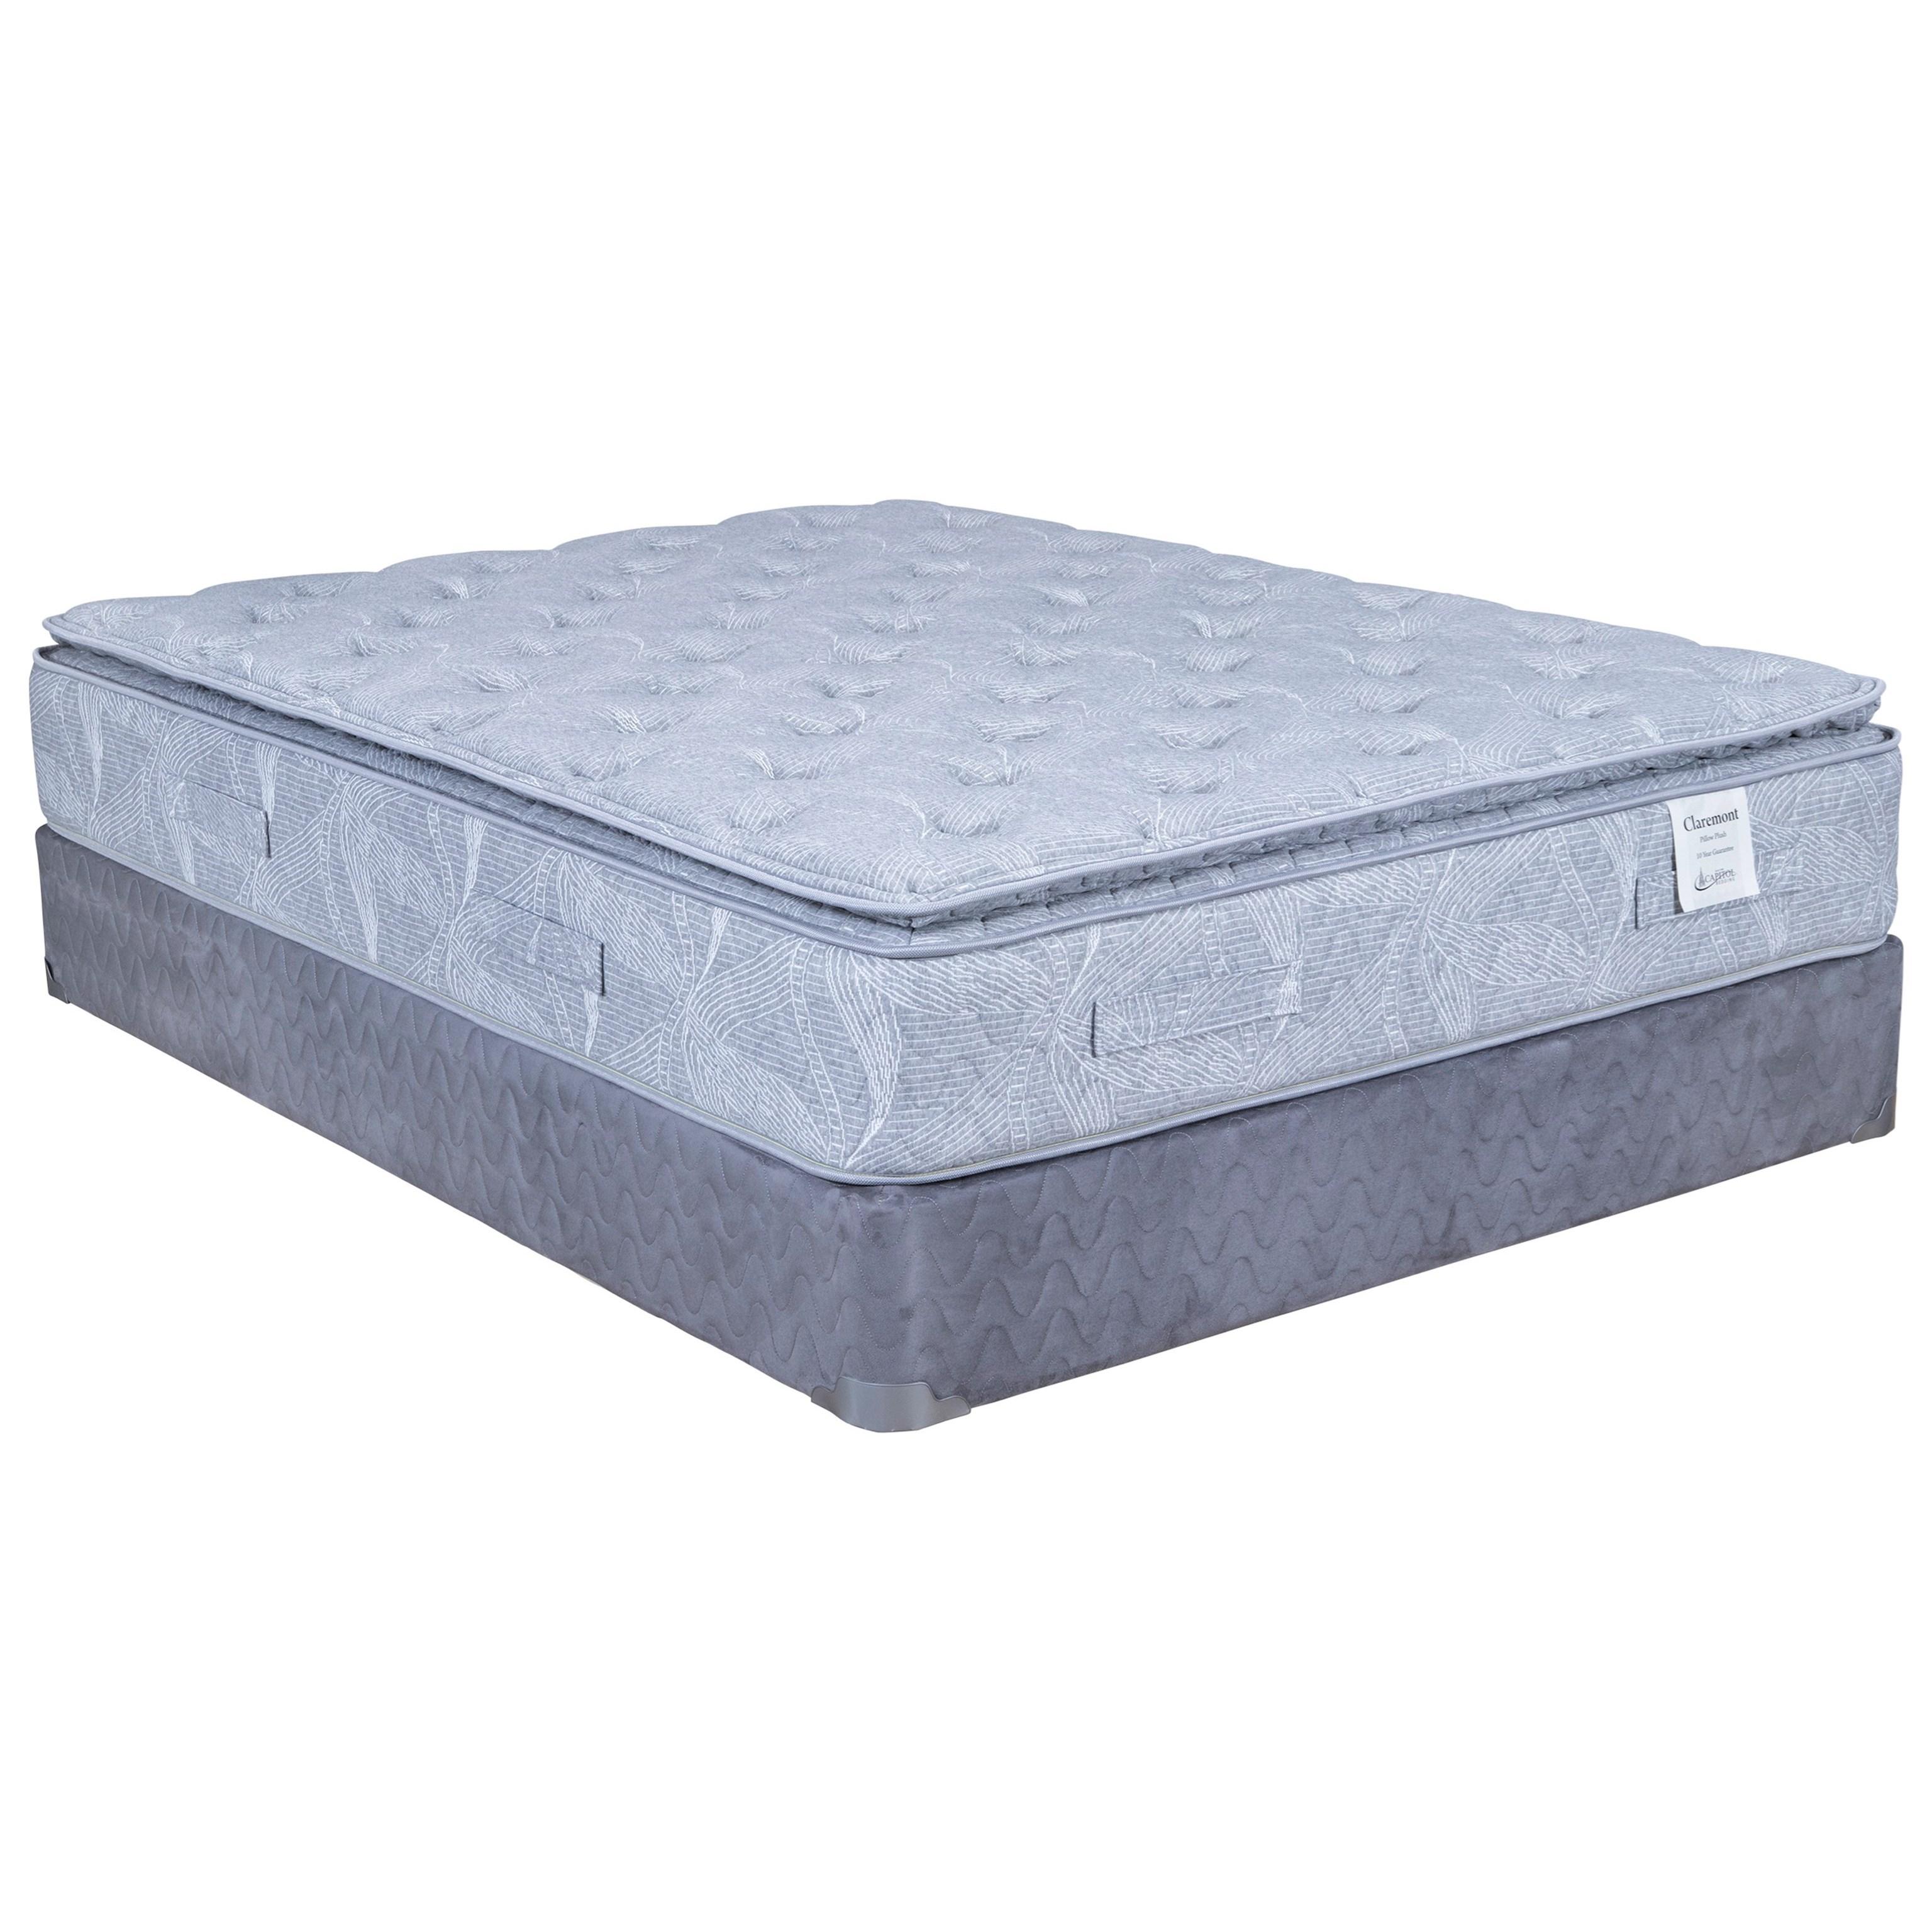 Claremont II Pillow Top Queen Pillow Top Mattress Set by Capitol Bedding at Van Hill Furniture